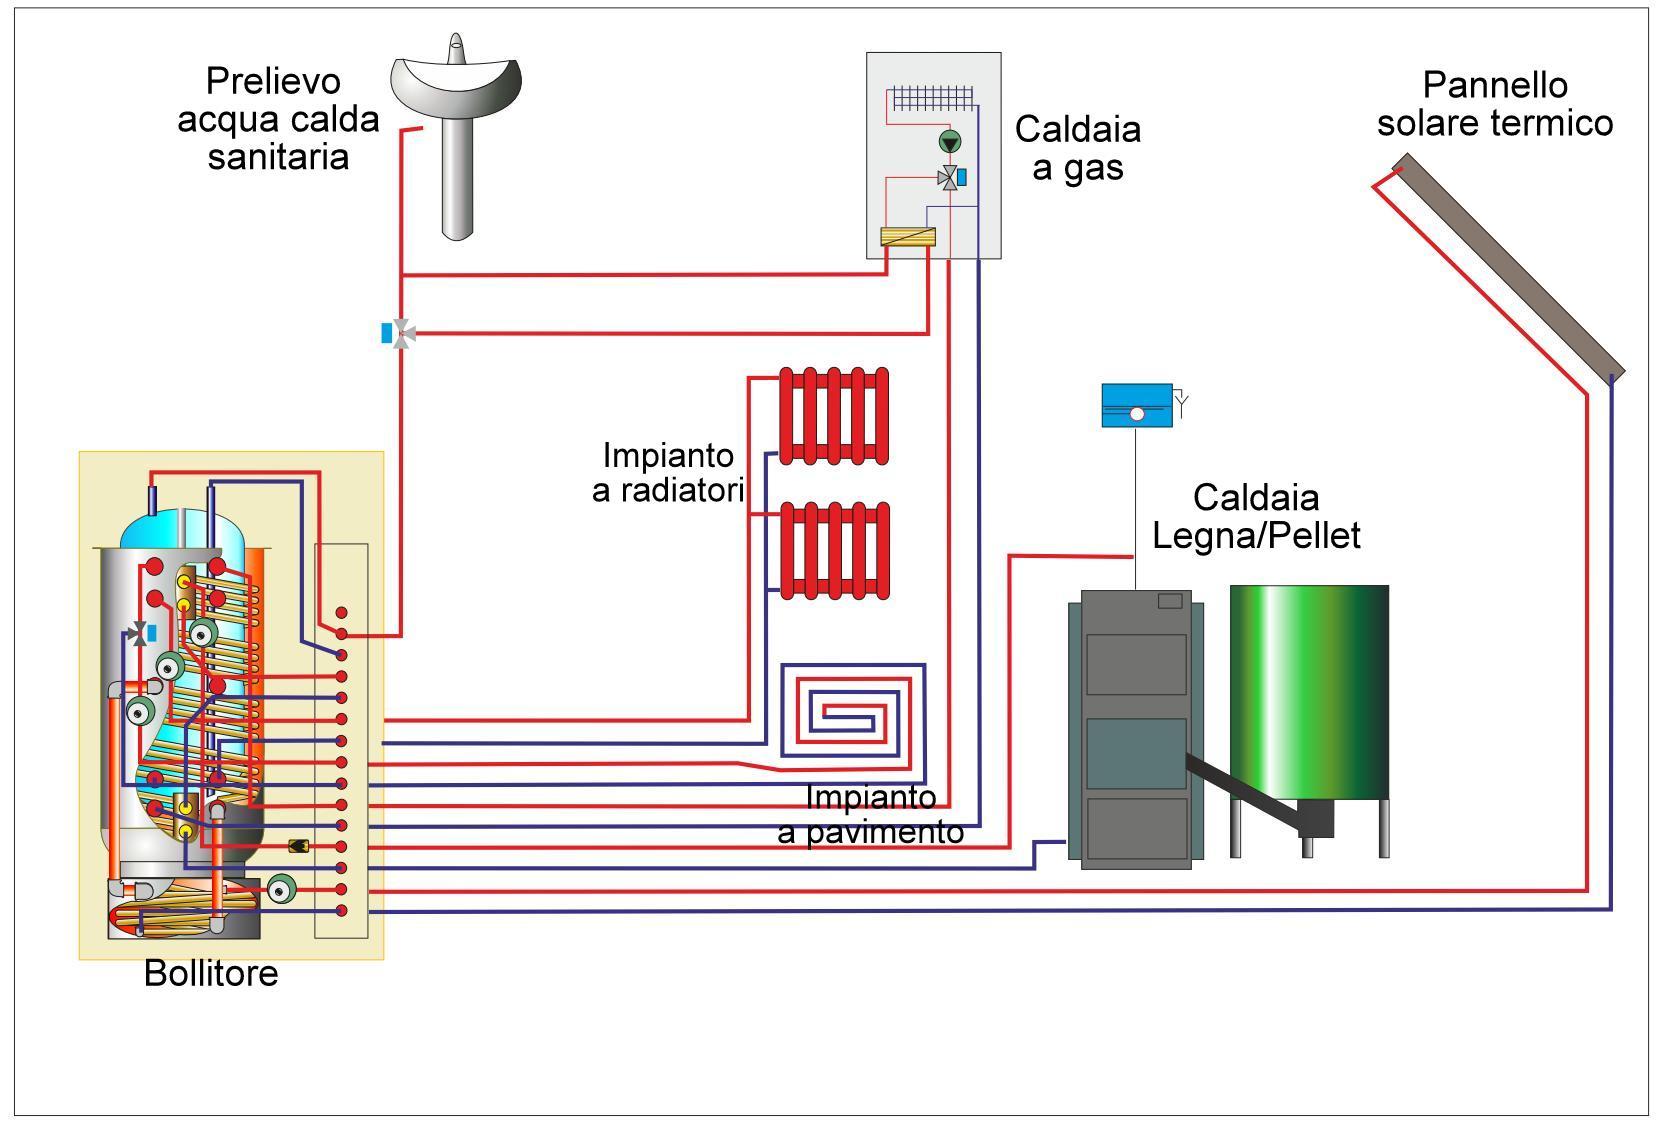 Temperatura Caldaia Impianto A Pavimento multi energy